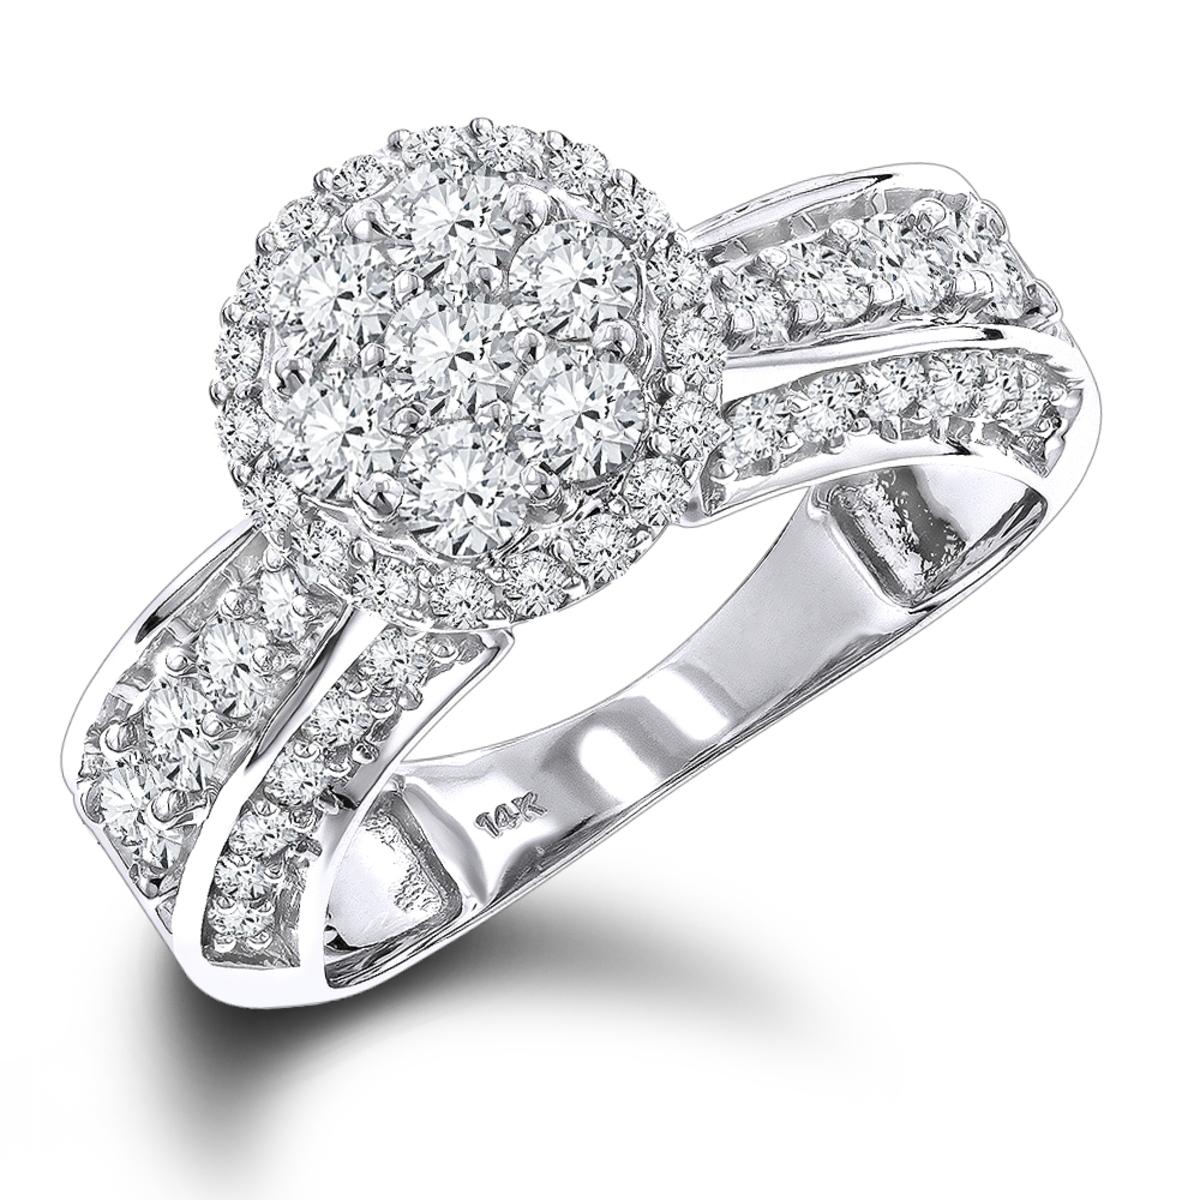 Ladies Diamond Rings 14K Gold Cluster Diamond Ring 1.6ct